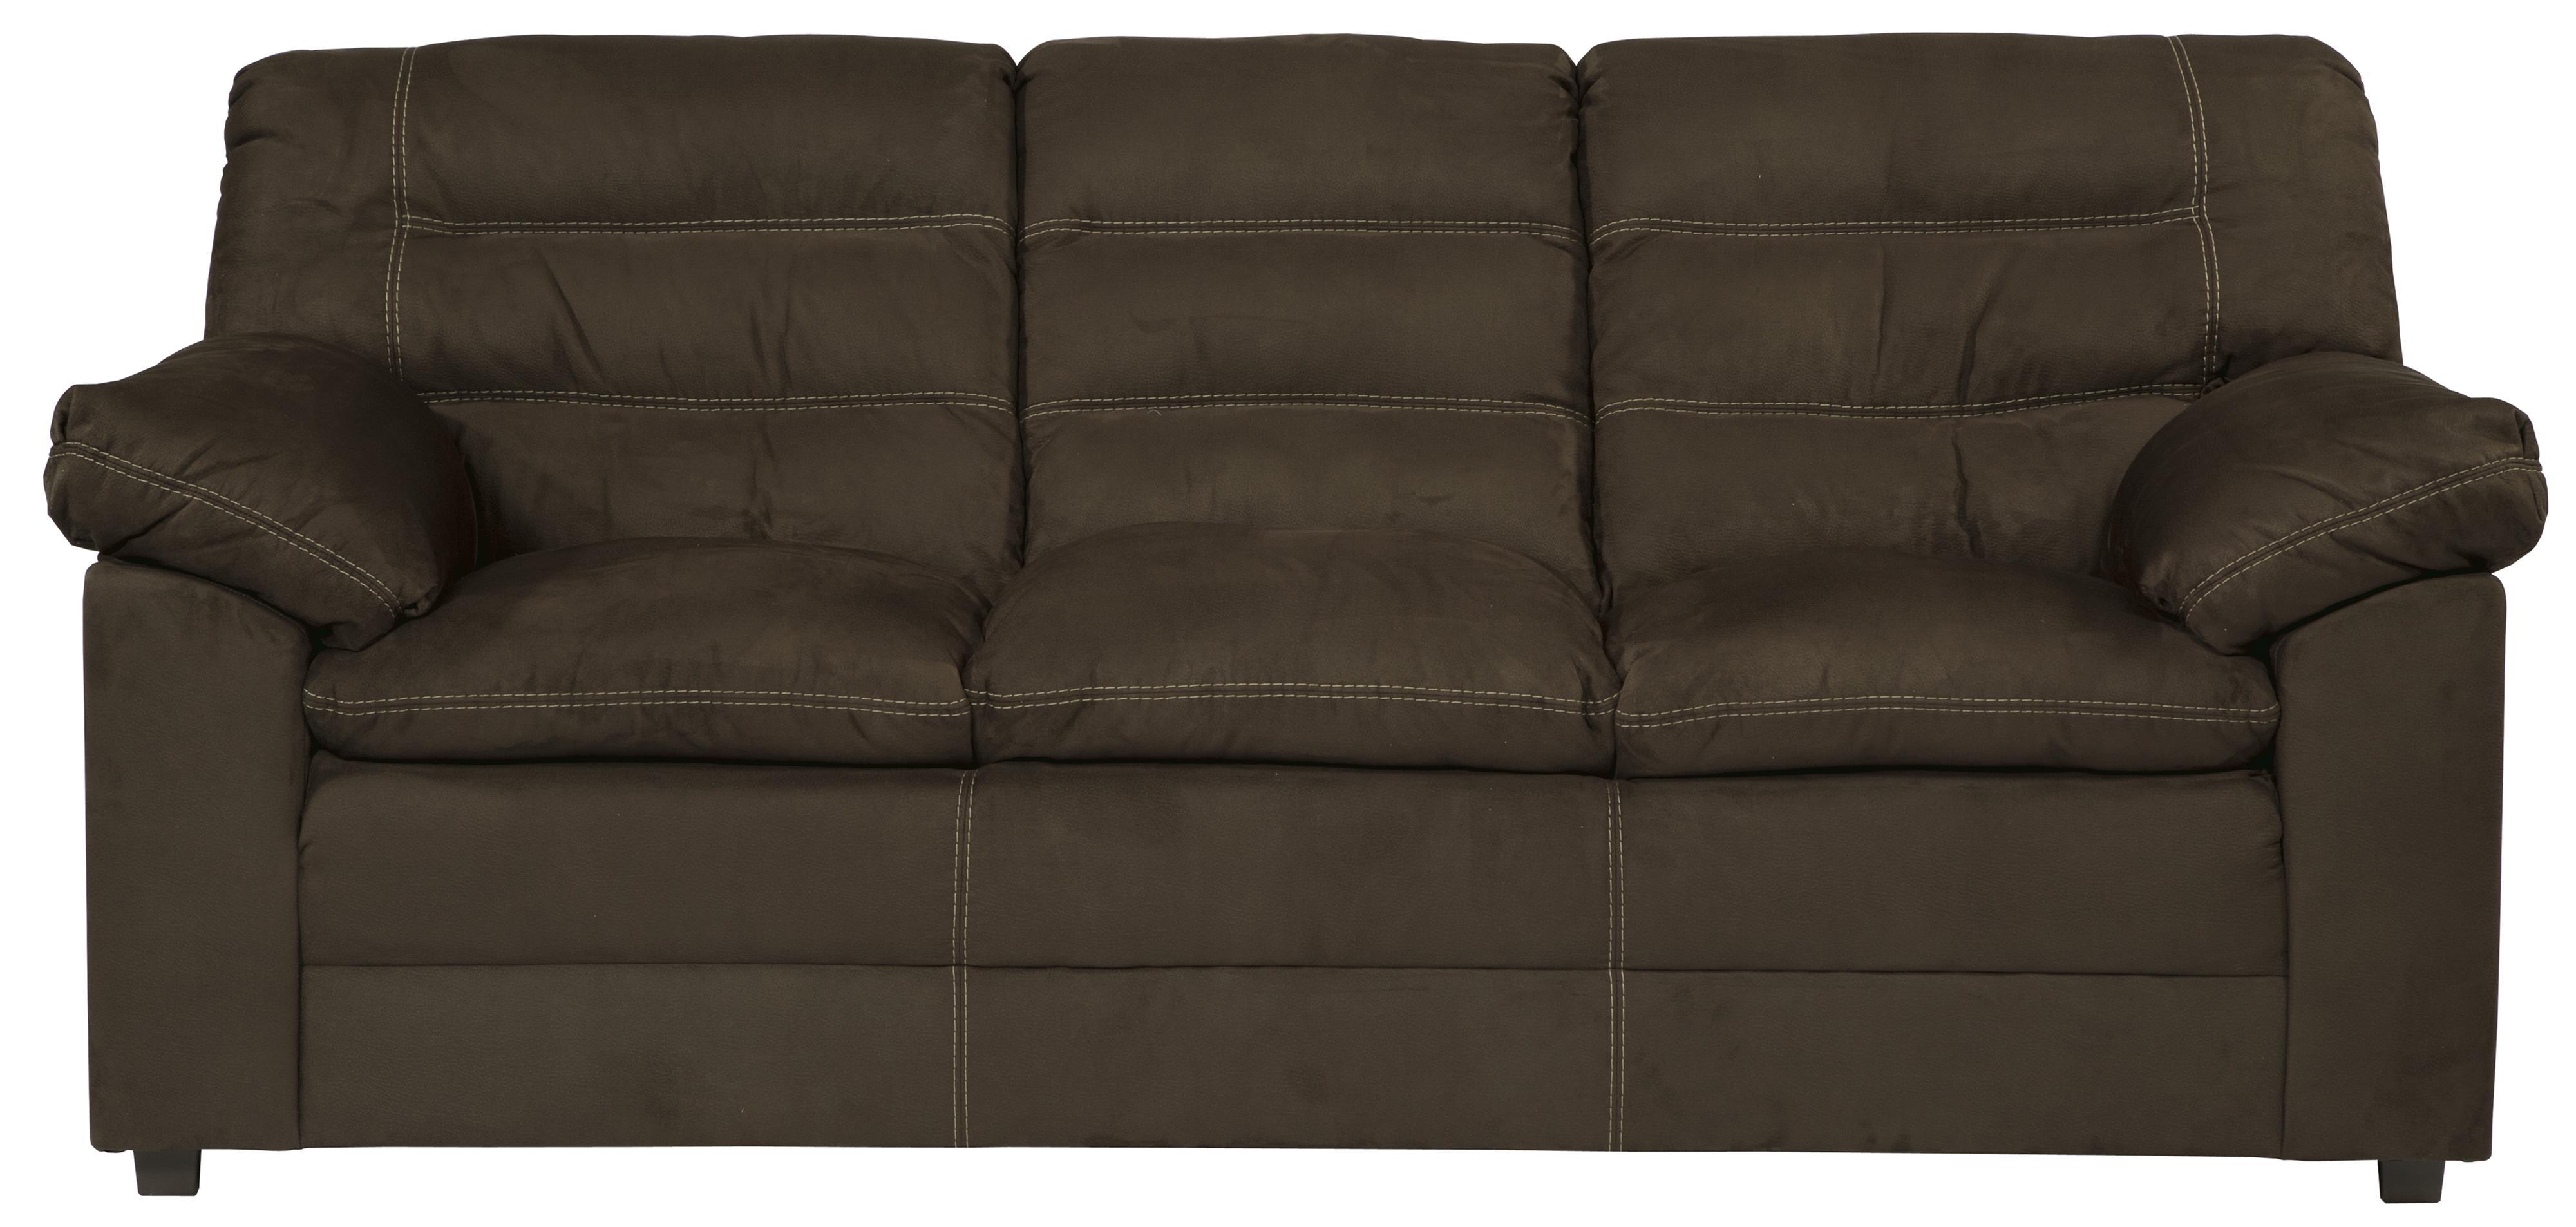 Benchcraft Talut Sofa - Item Number: 2990038